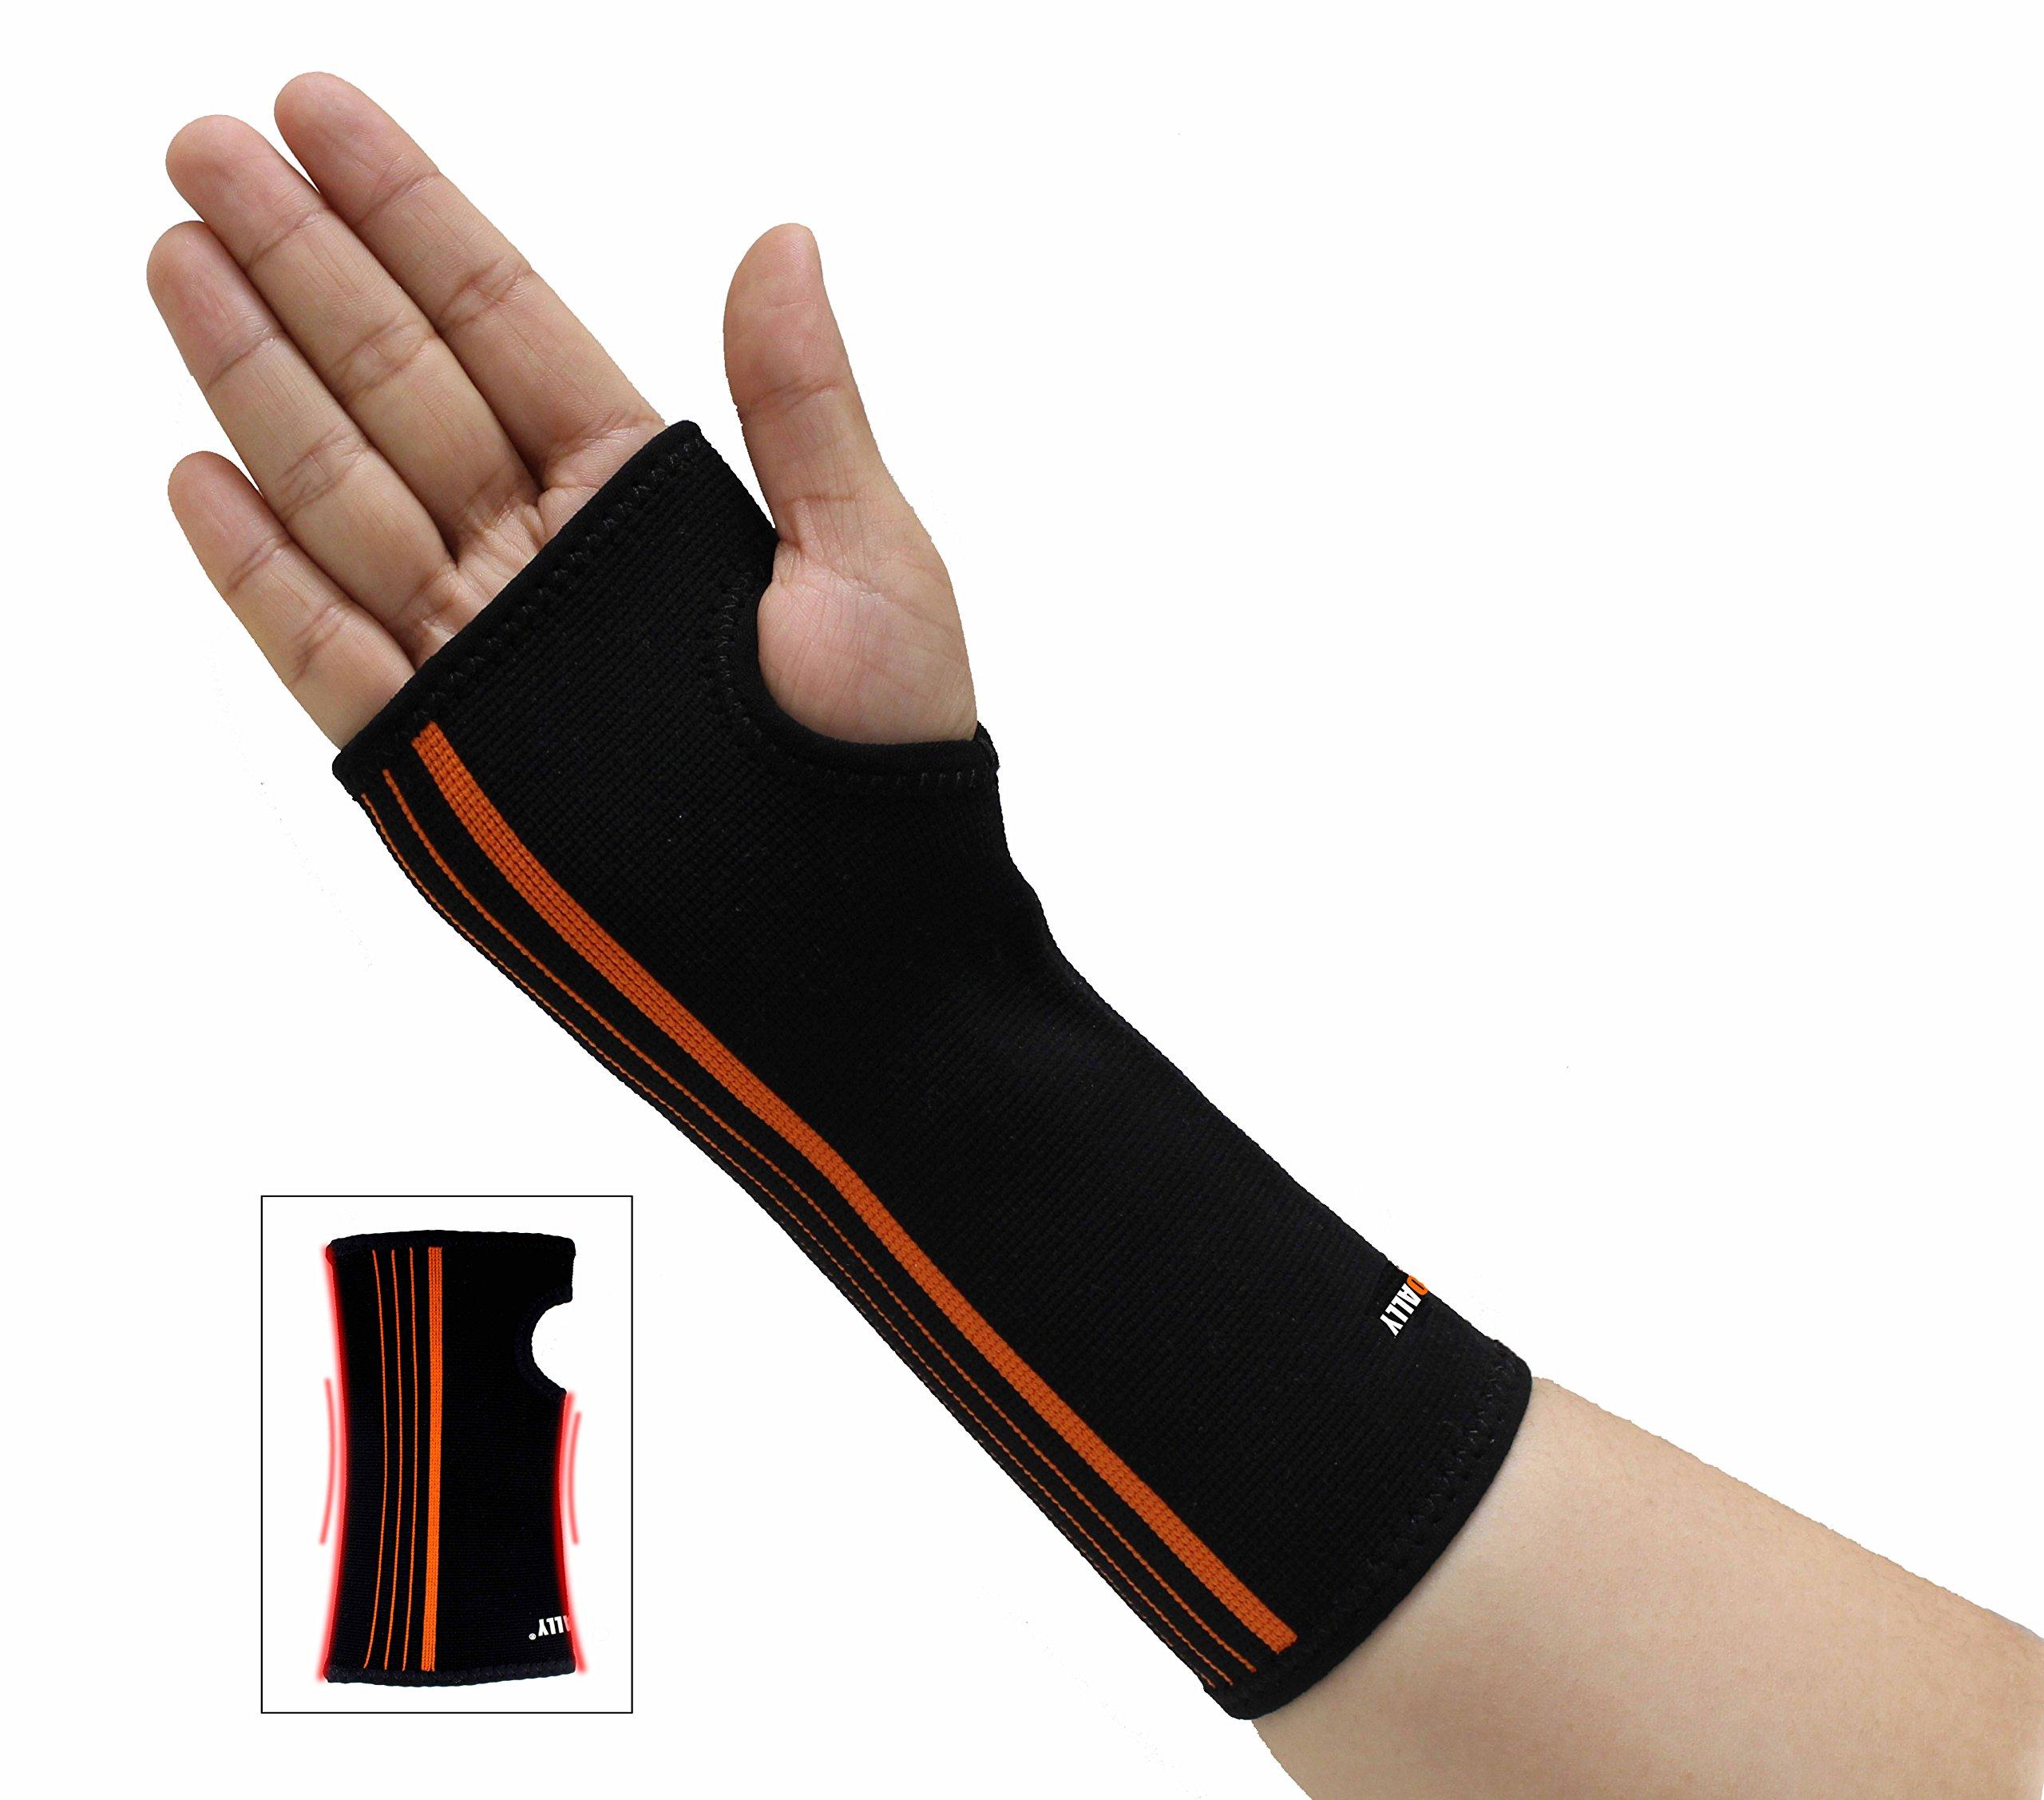 NEOALLY Wrist Sleeve Support Hand Compression Brace for Carpal Tunnel, Arthritis, Tendonitis, Bursitis and Wrist Sprain (Medium Single)